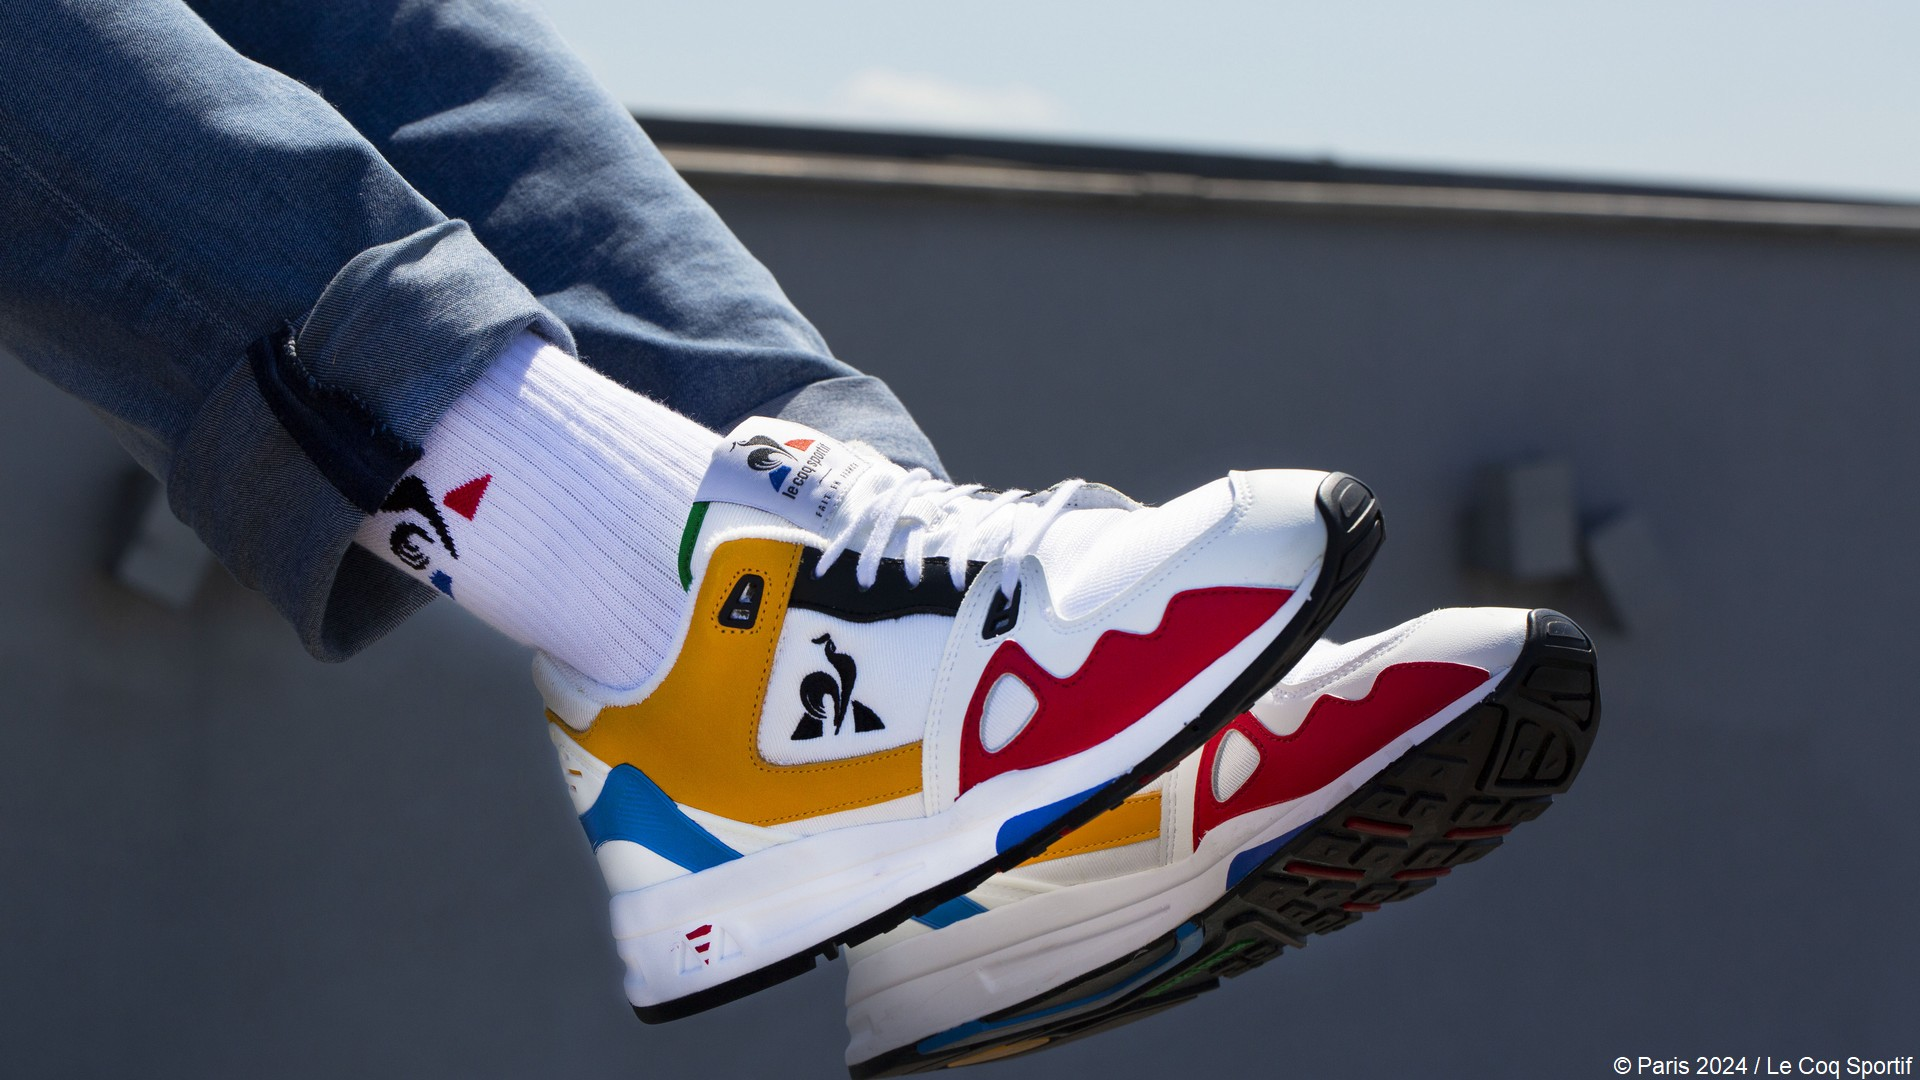 Le Coq Sportif x Paris 2024 (sneakers) 2021